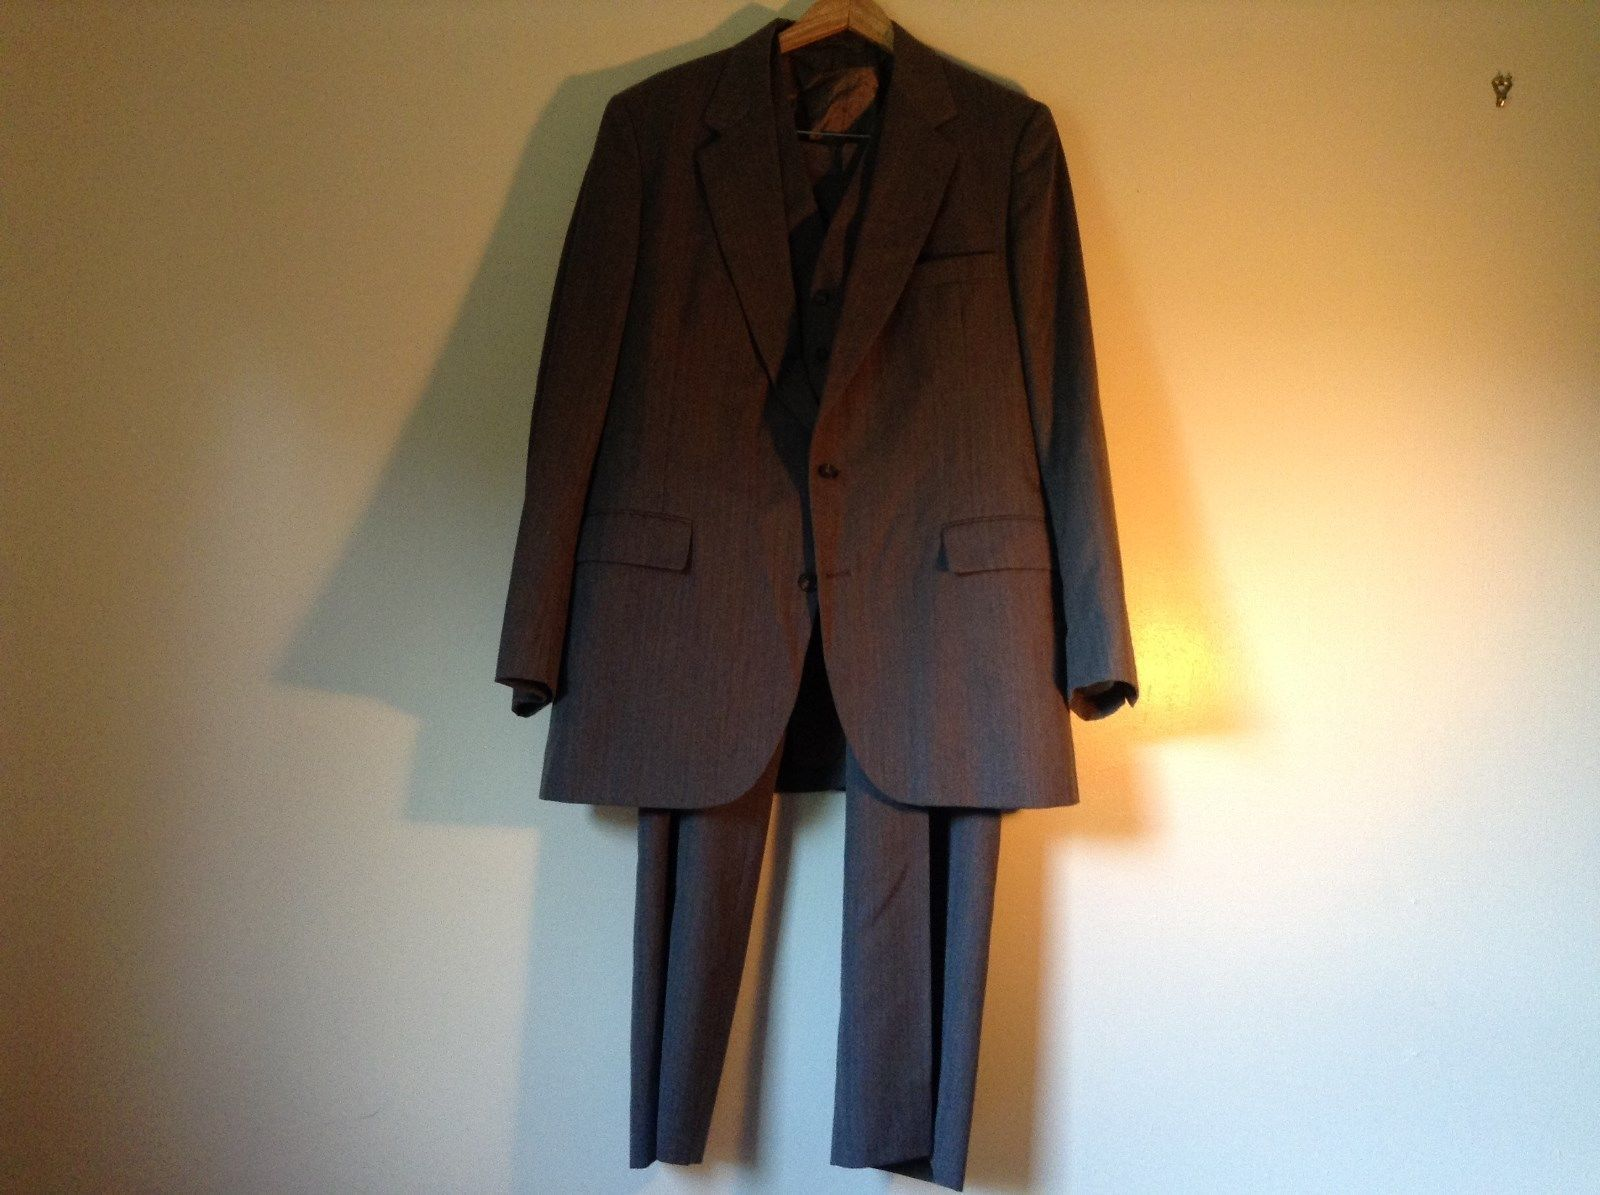 Gray American Trend 3 Piece Suit Vest Jacket and Pants Measurements Below